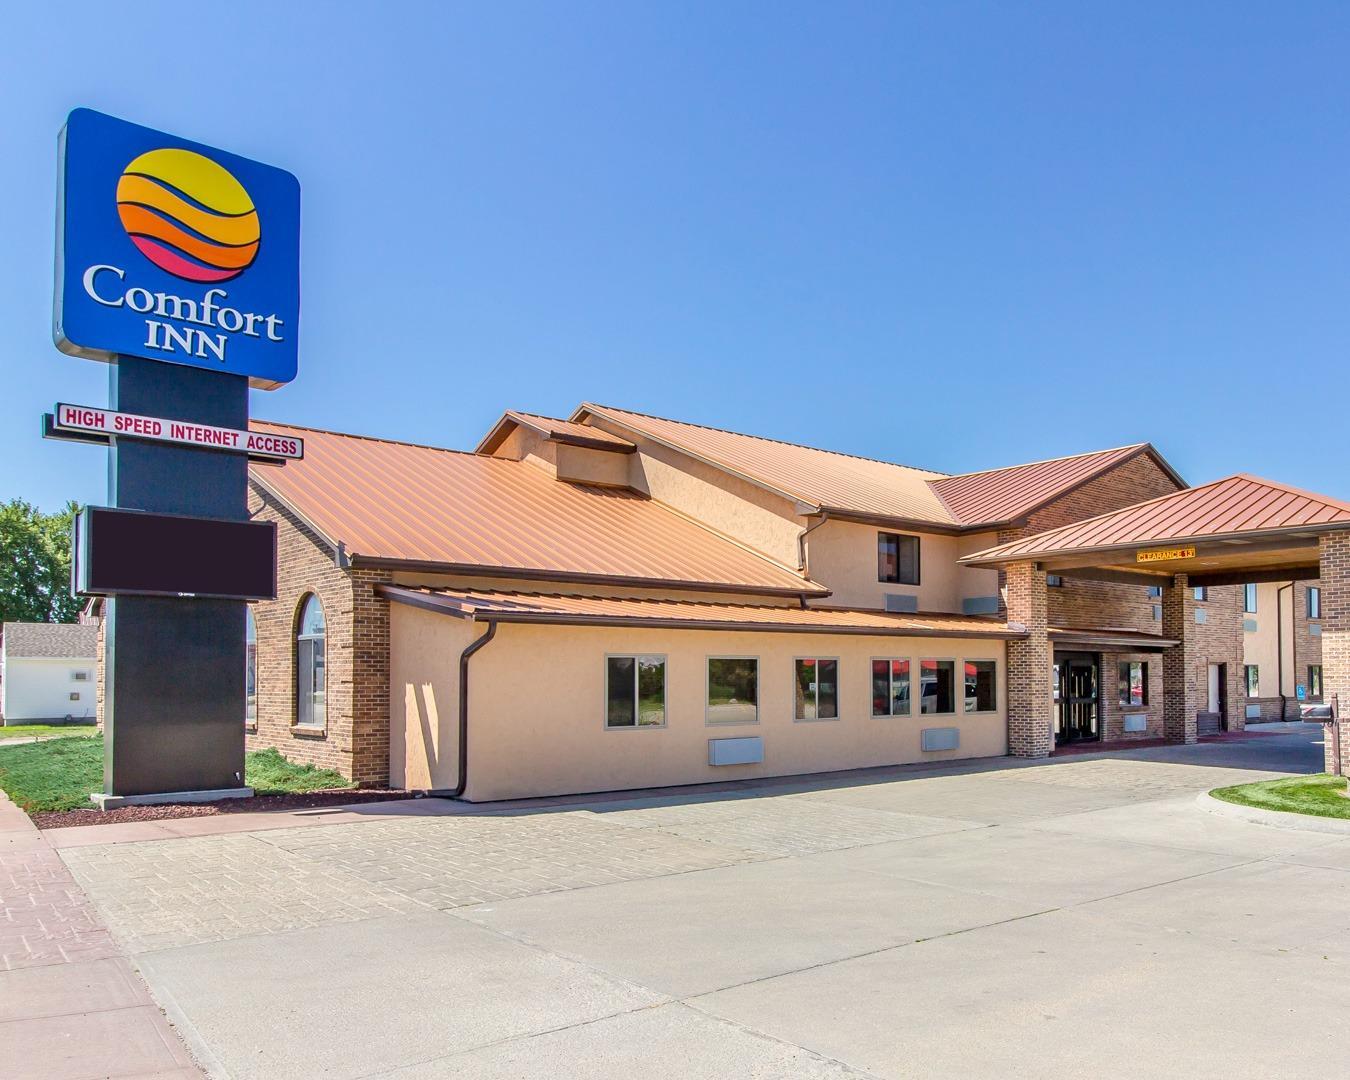 Comfort Inn In Valentine NE 402 376 3